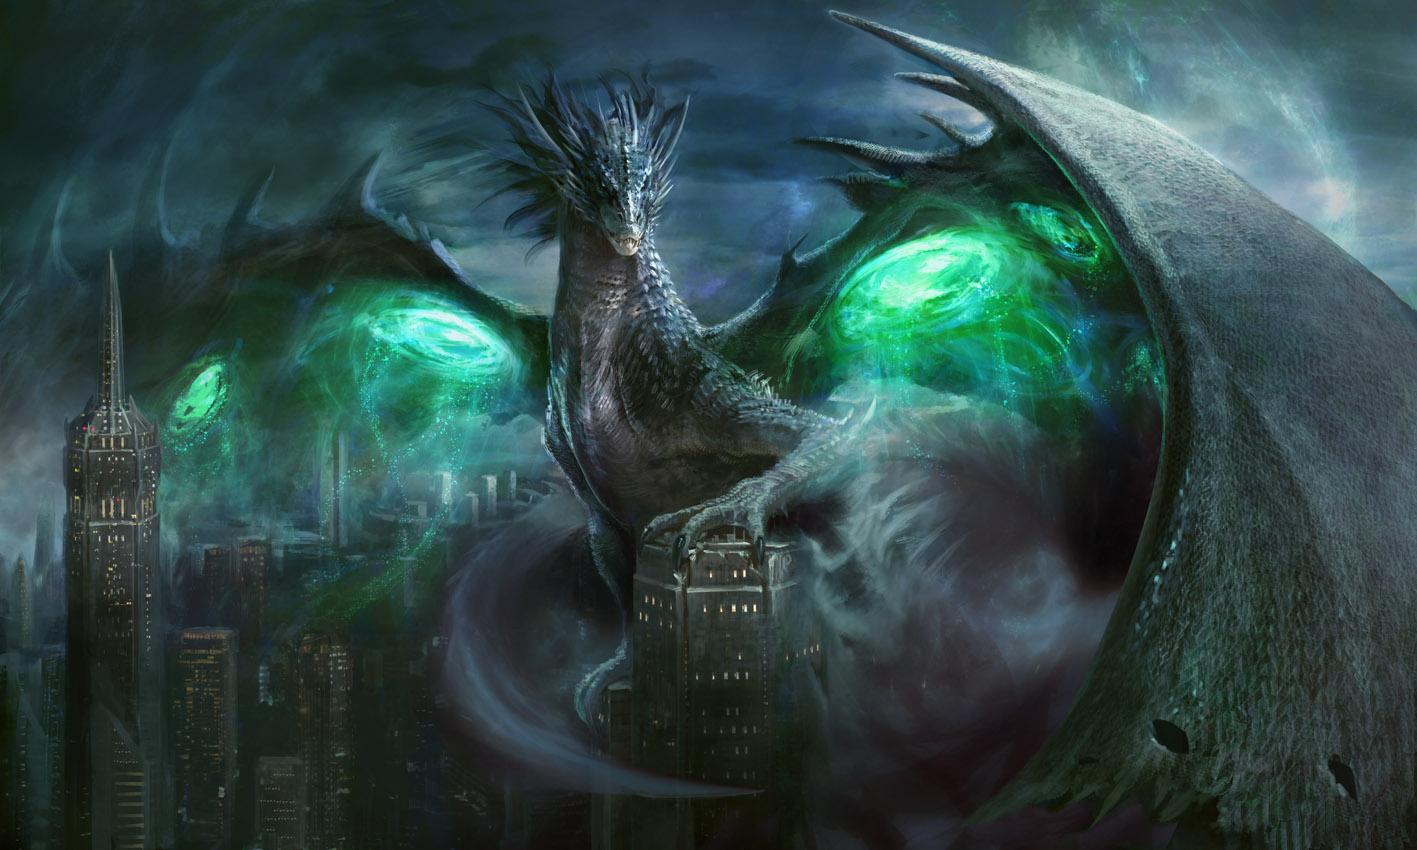 Mythgard - Sablewing Zira by Manzanedo